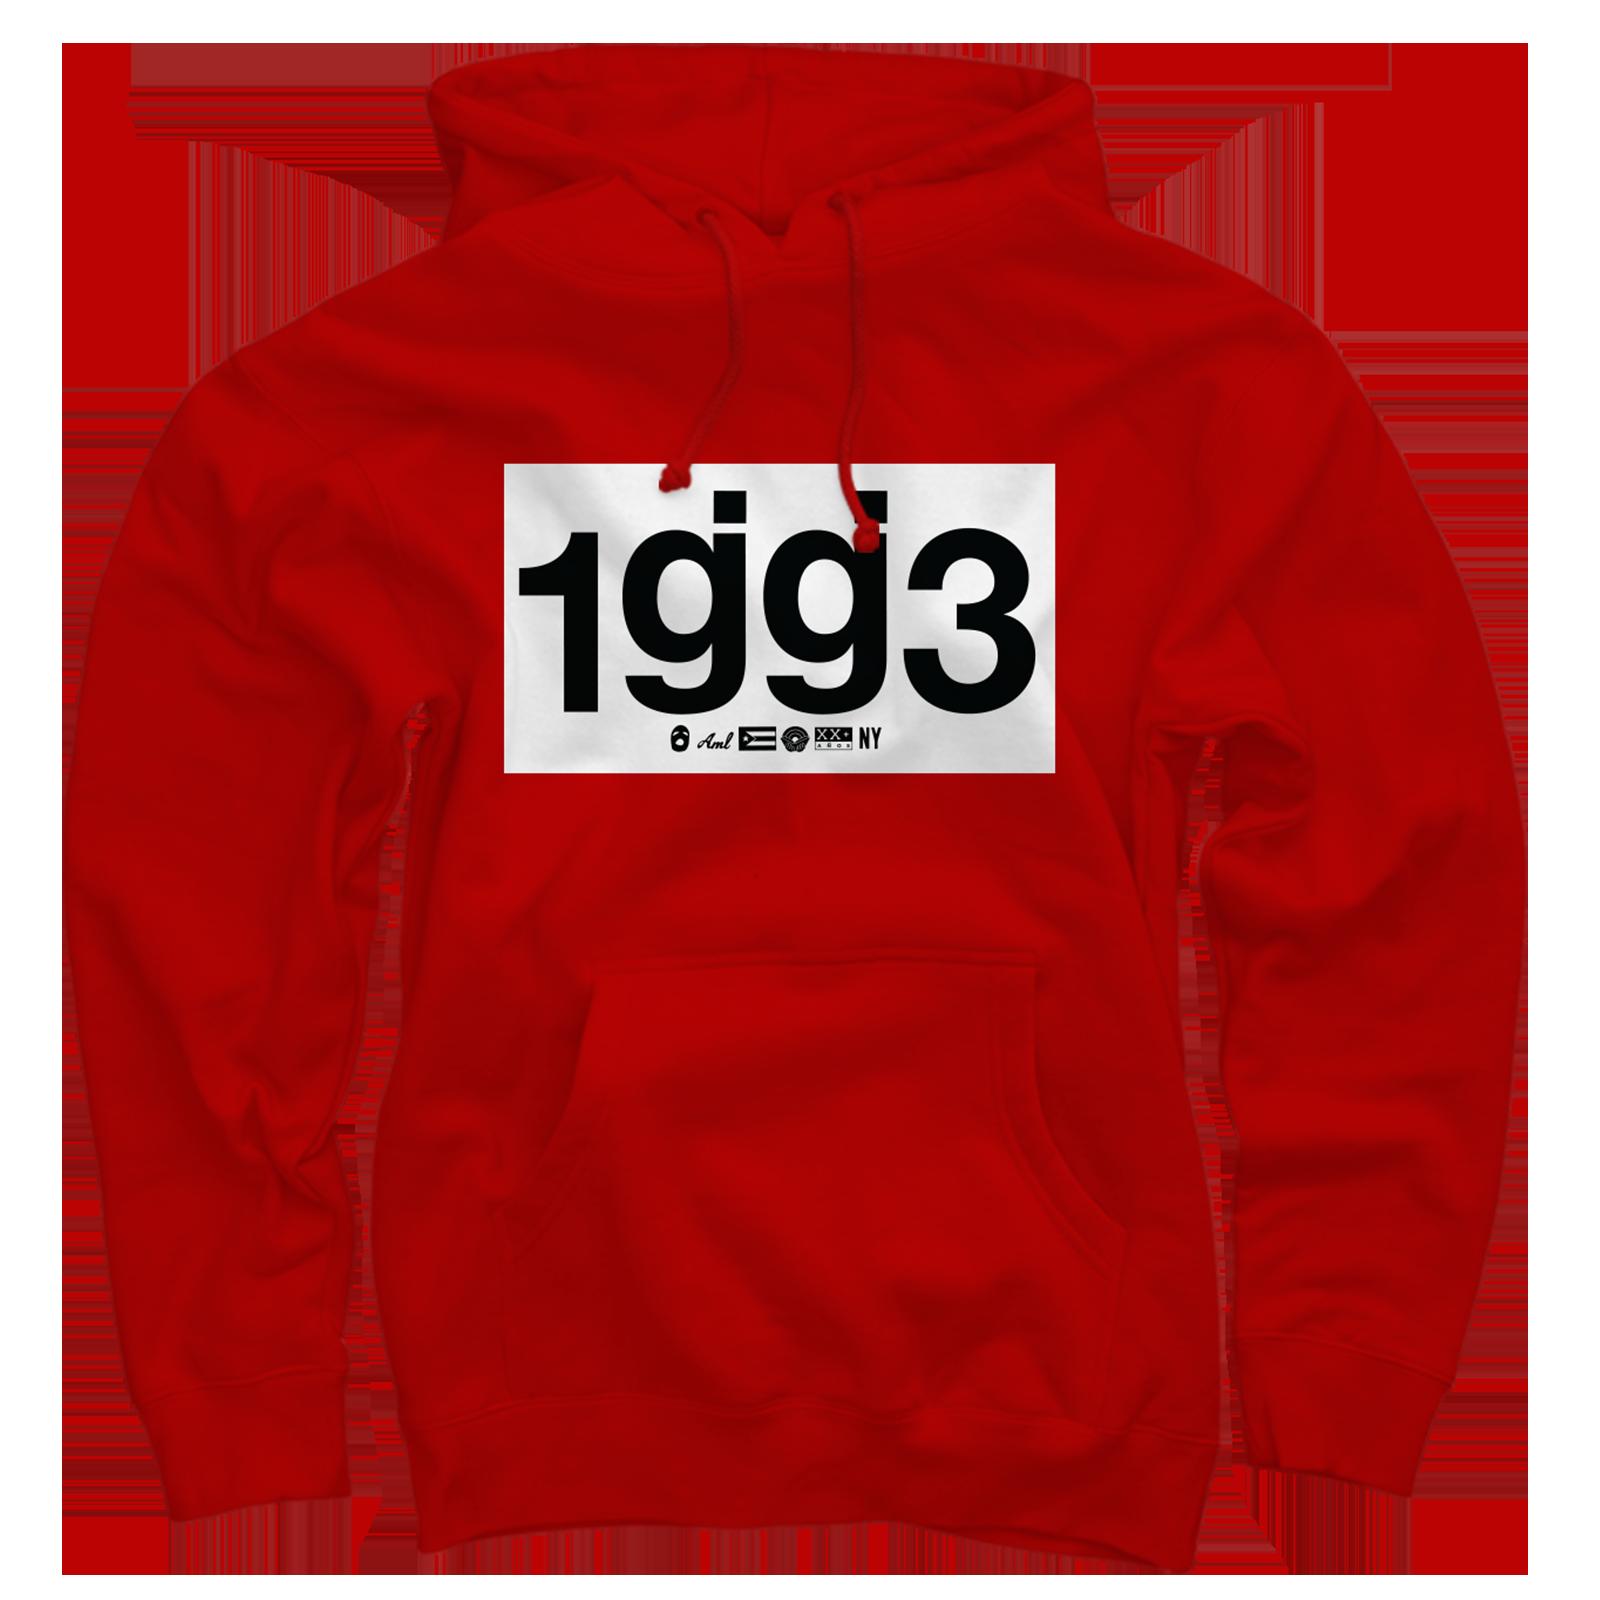 CB 1gg3 Red Pullover Sweatshirt